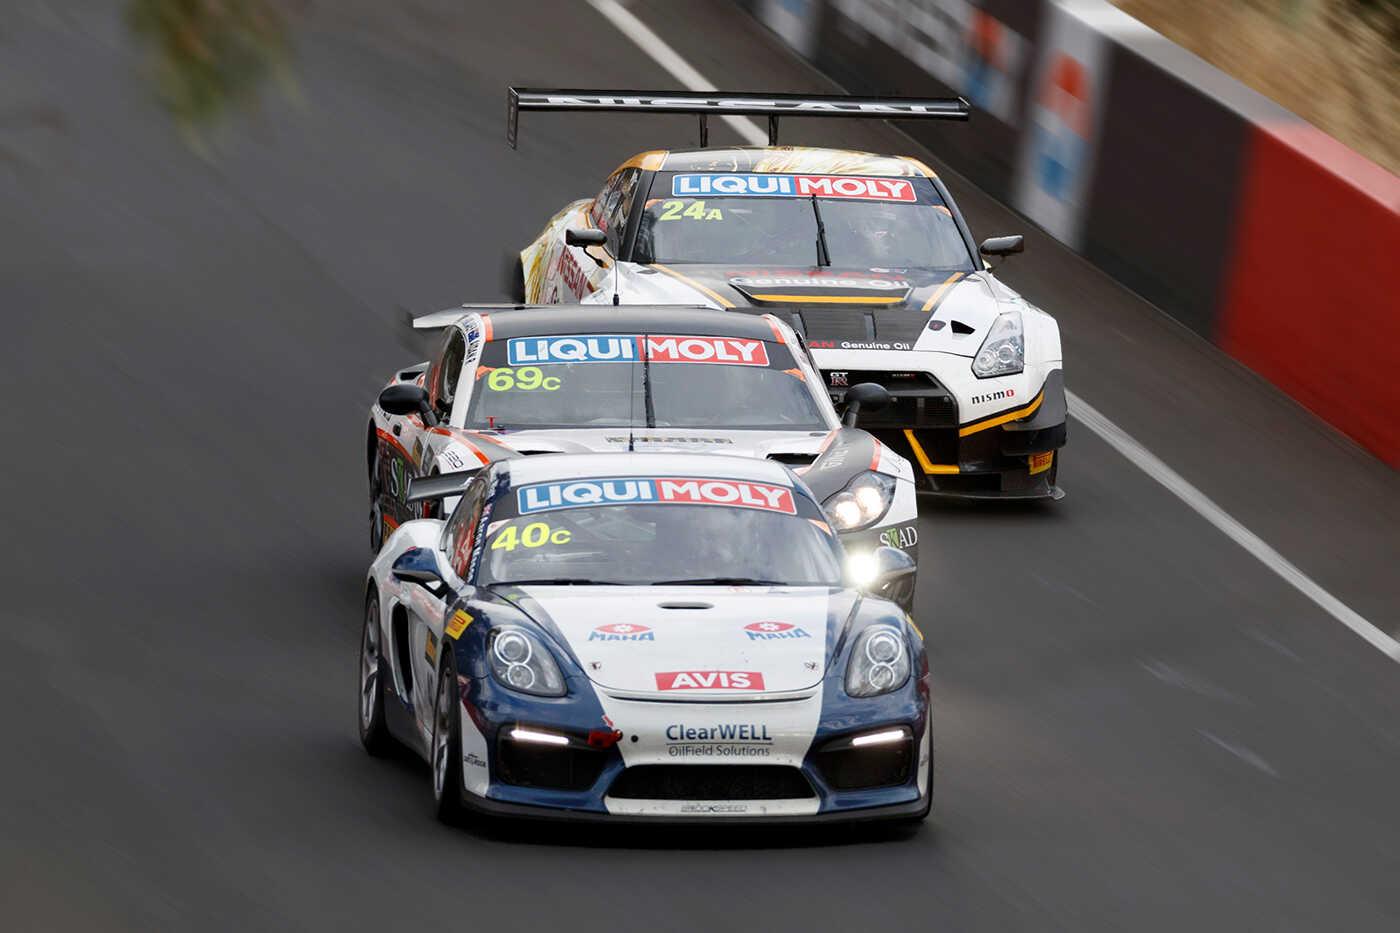 Brookspeed's yellow and blue Porsche Boxster 'S' race car Calum Lockie